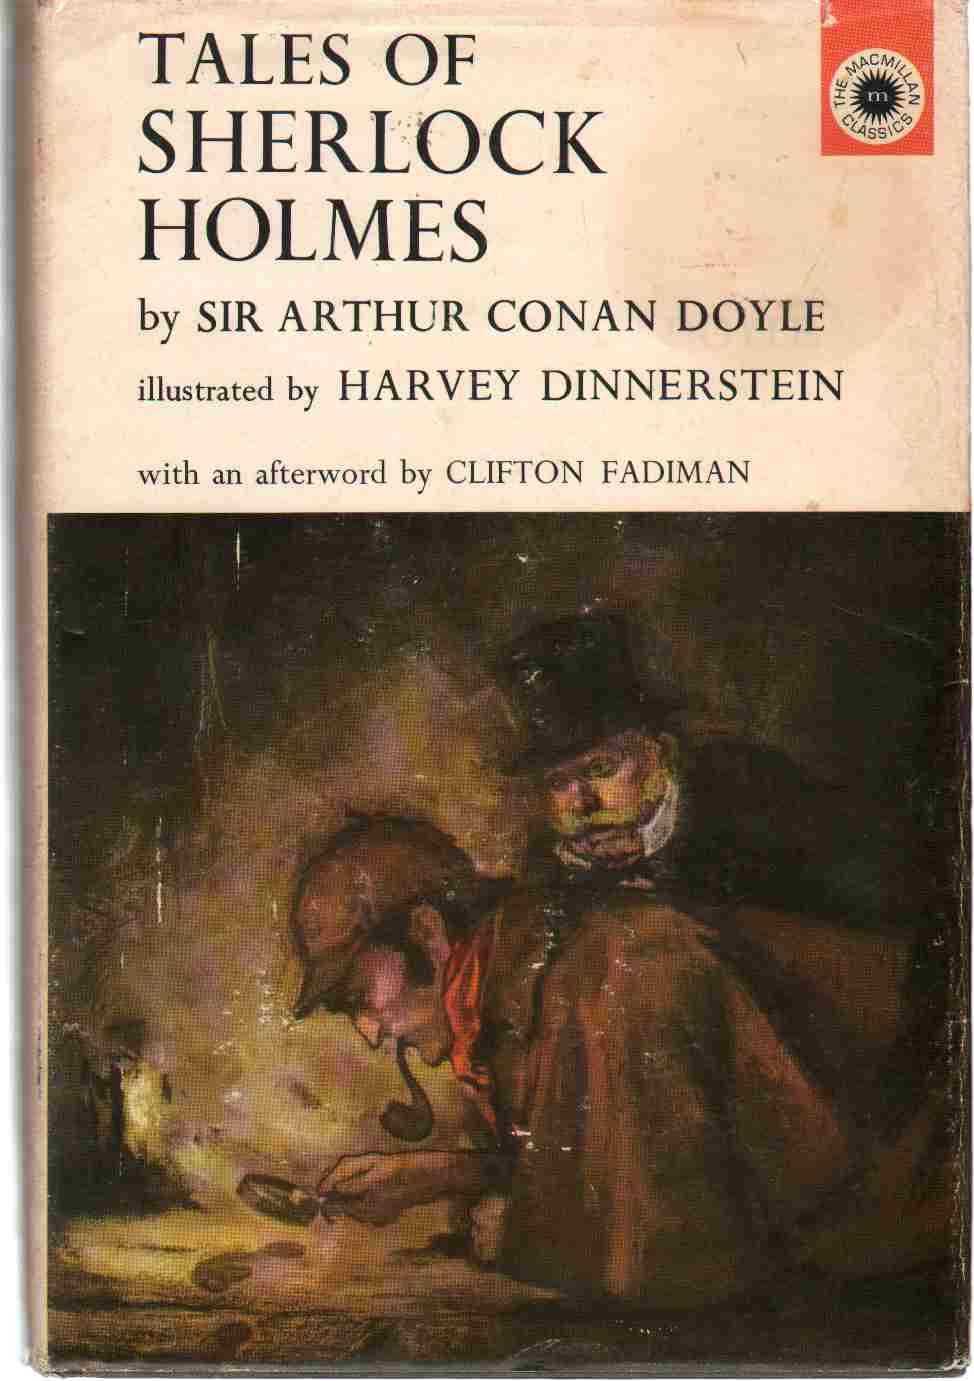 TALES OF SHERLOCK HOLMES, Doyle, Arthur Conan